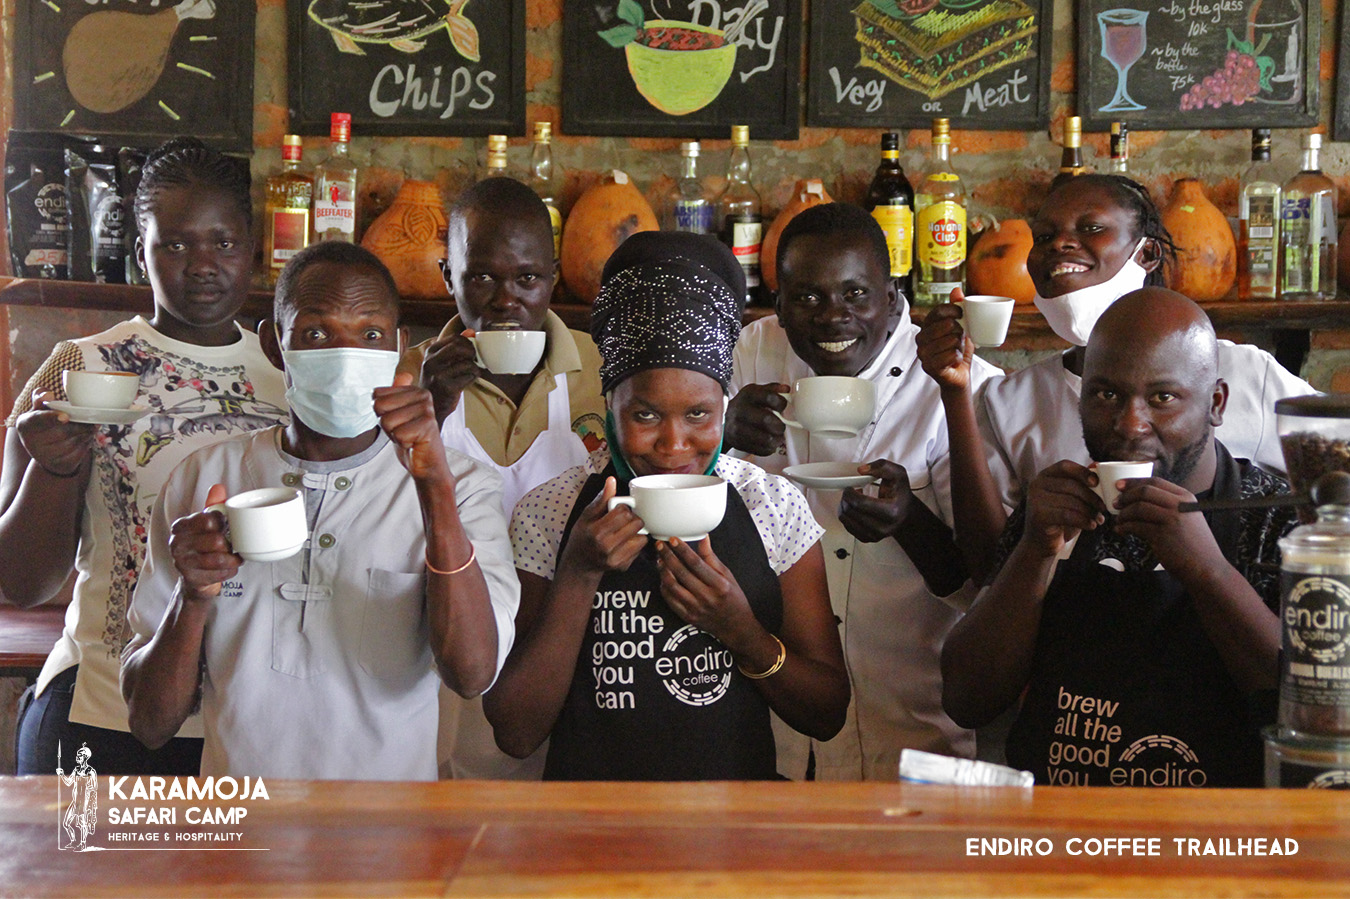 kara tunga moroto karamoja uganda endiro coffee cafe hotel restaurant 8